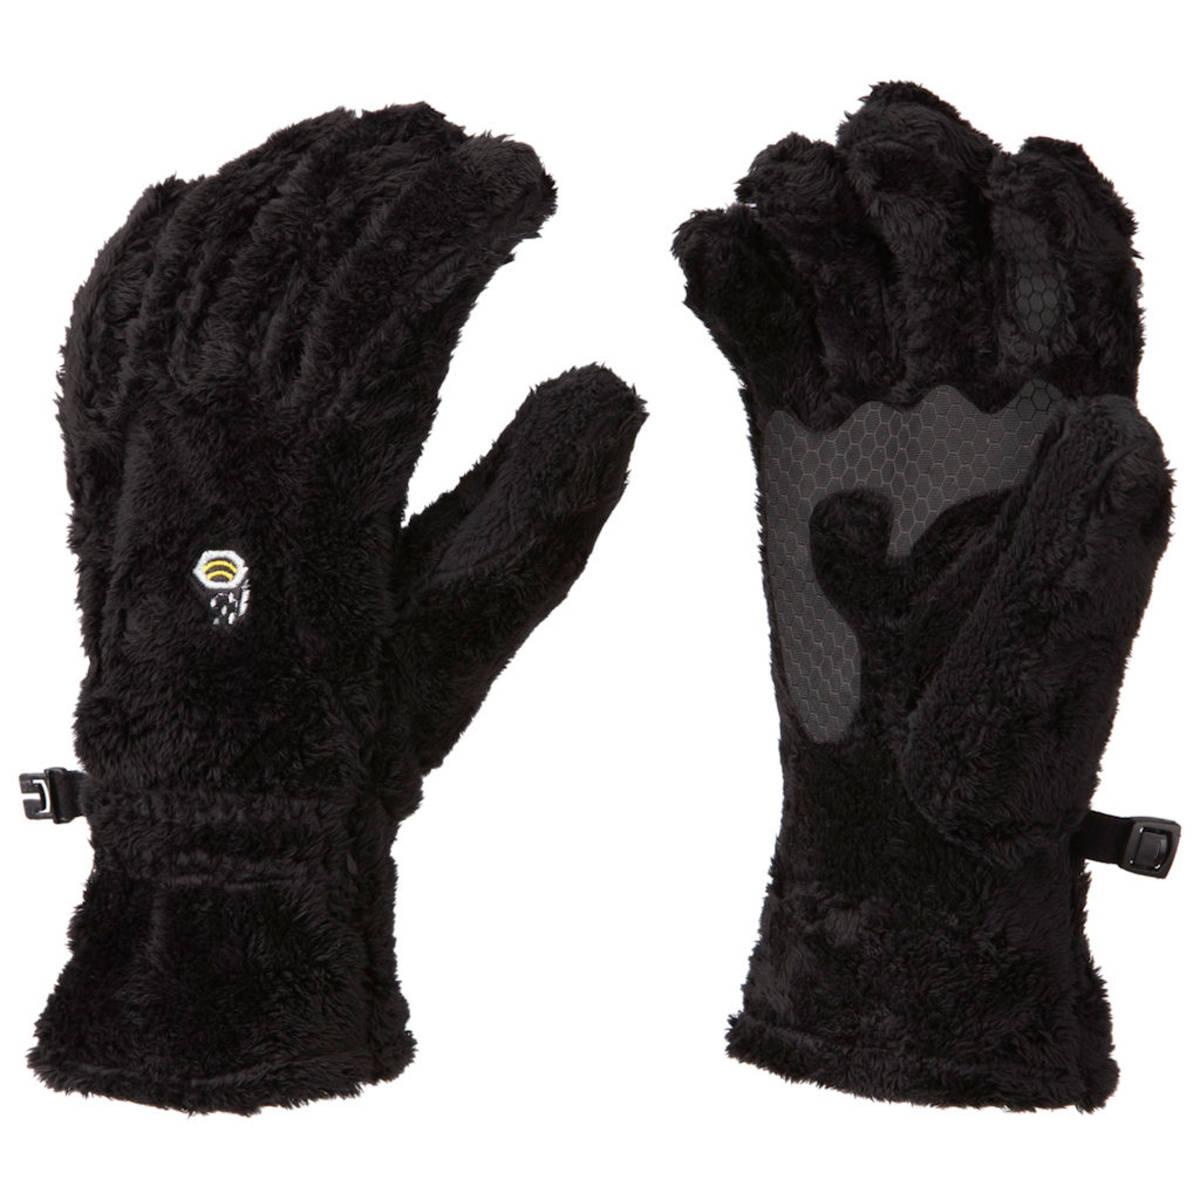 Monkey Glove (Mountain Hardwear)